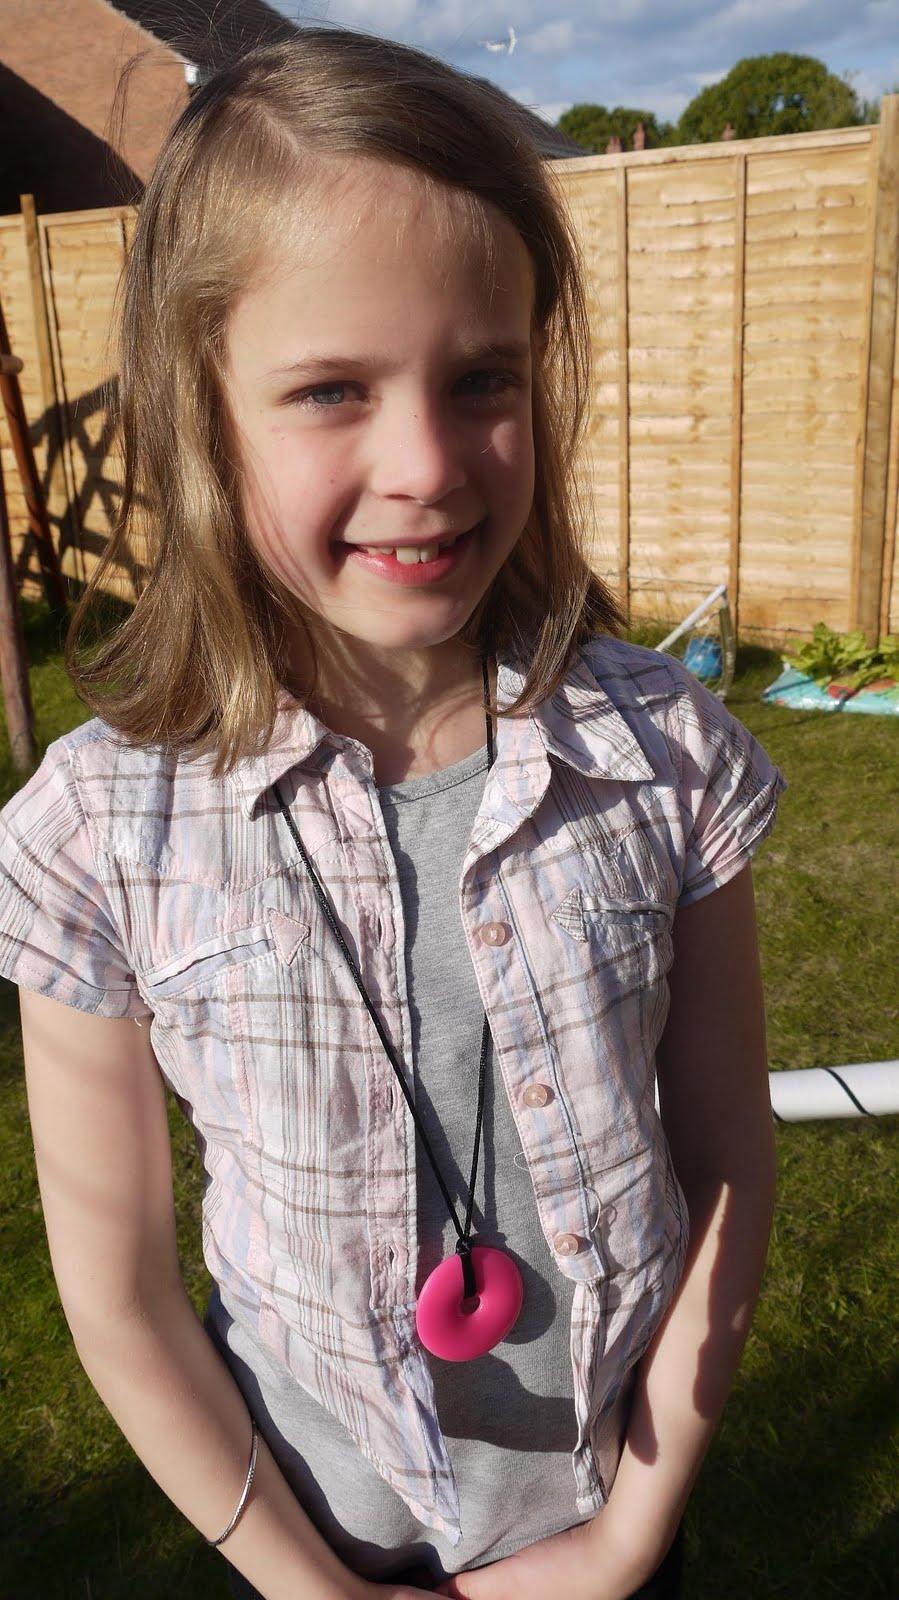 Teen Bling...Safe Accessories for Tweens!